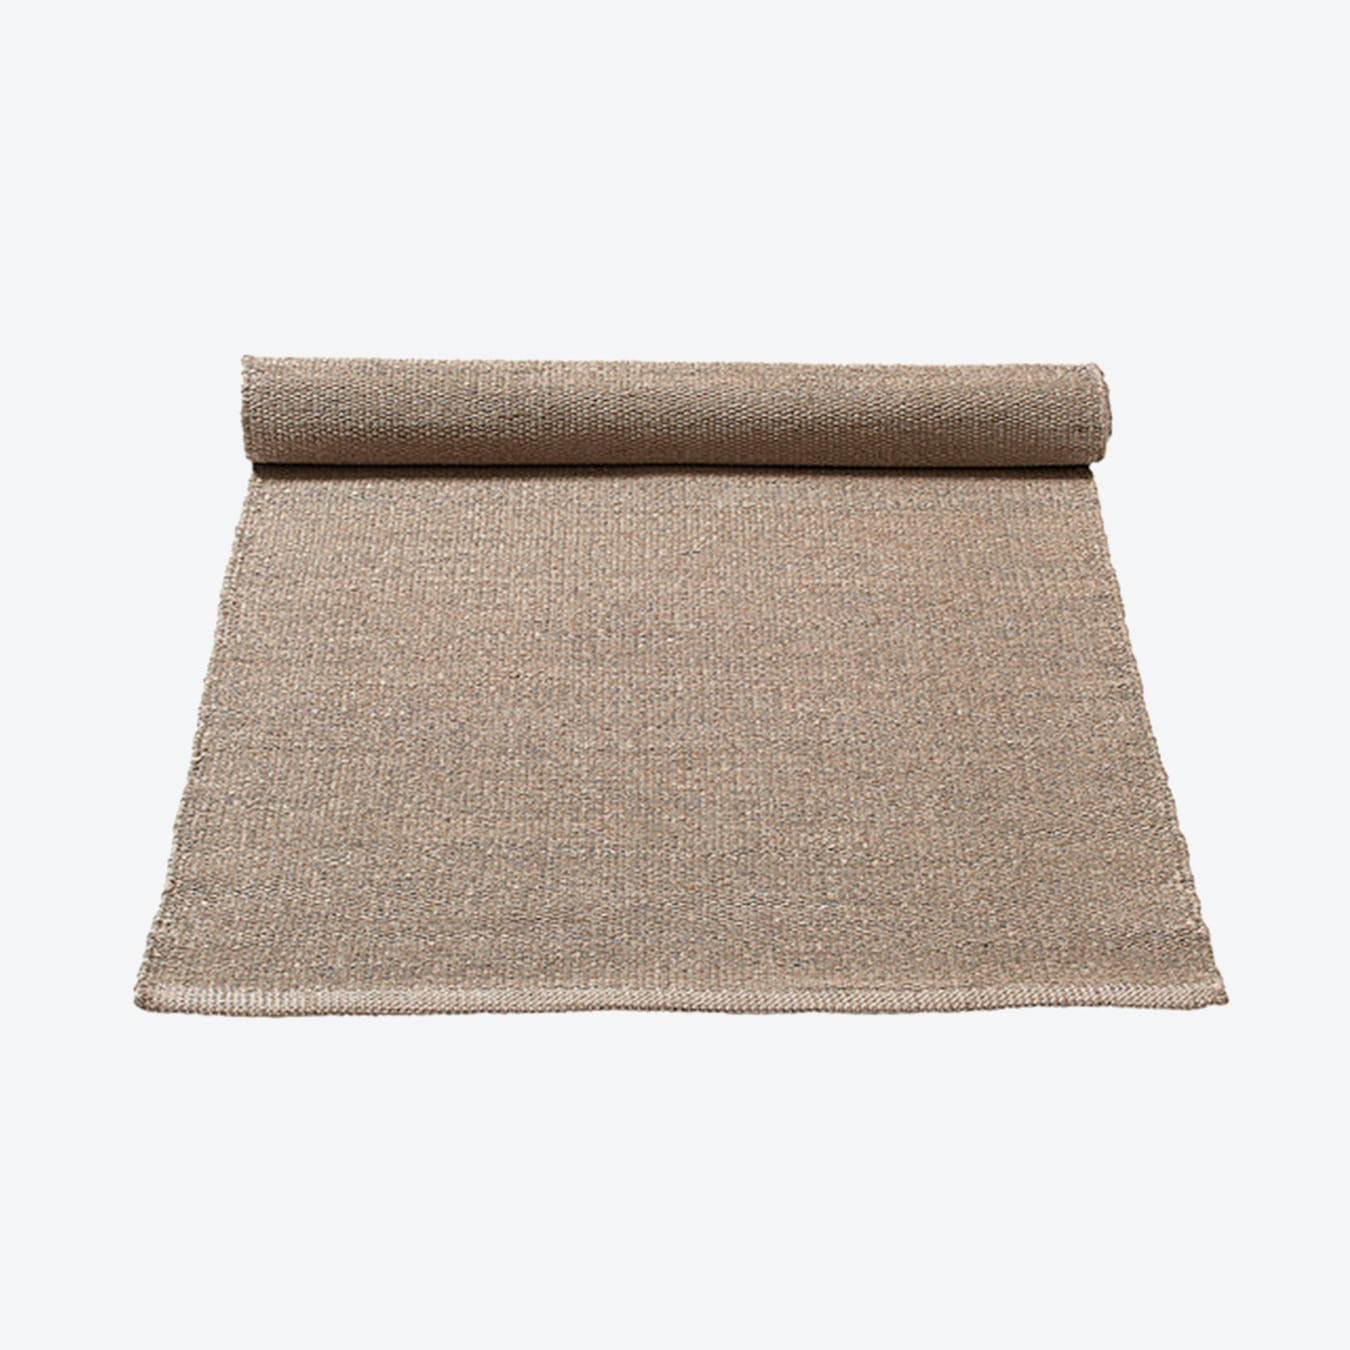 Plastic Rug in Dusty Sand (200 x 300 cm)